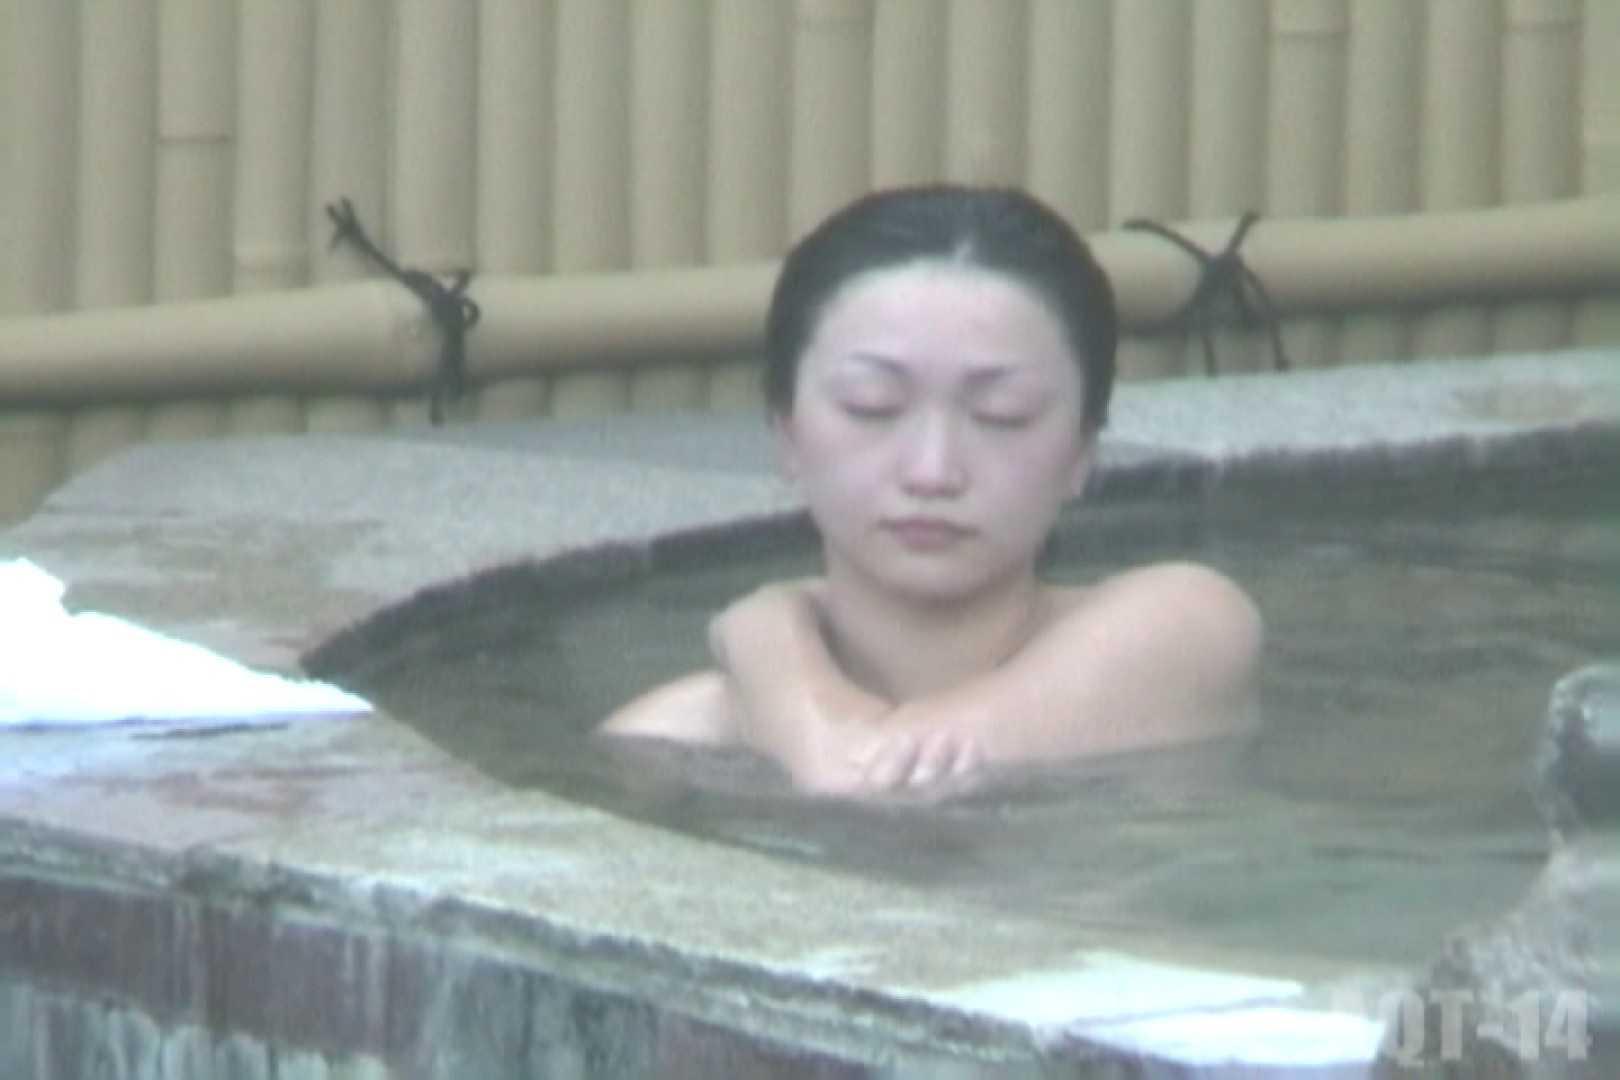 Aquaな露天風呂Vol.826 盗撮 | OLエロ画像  88PICs 40